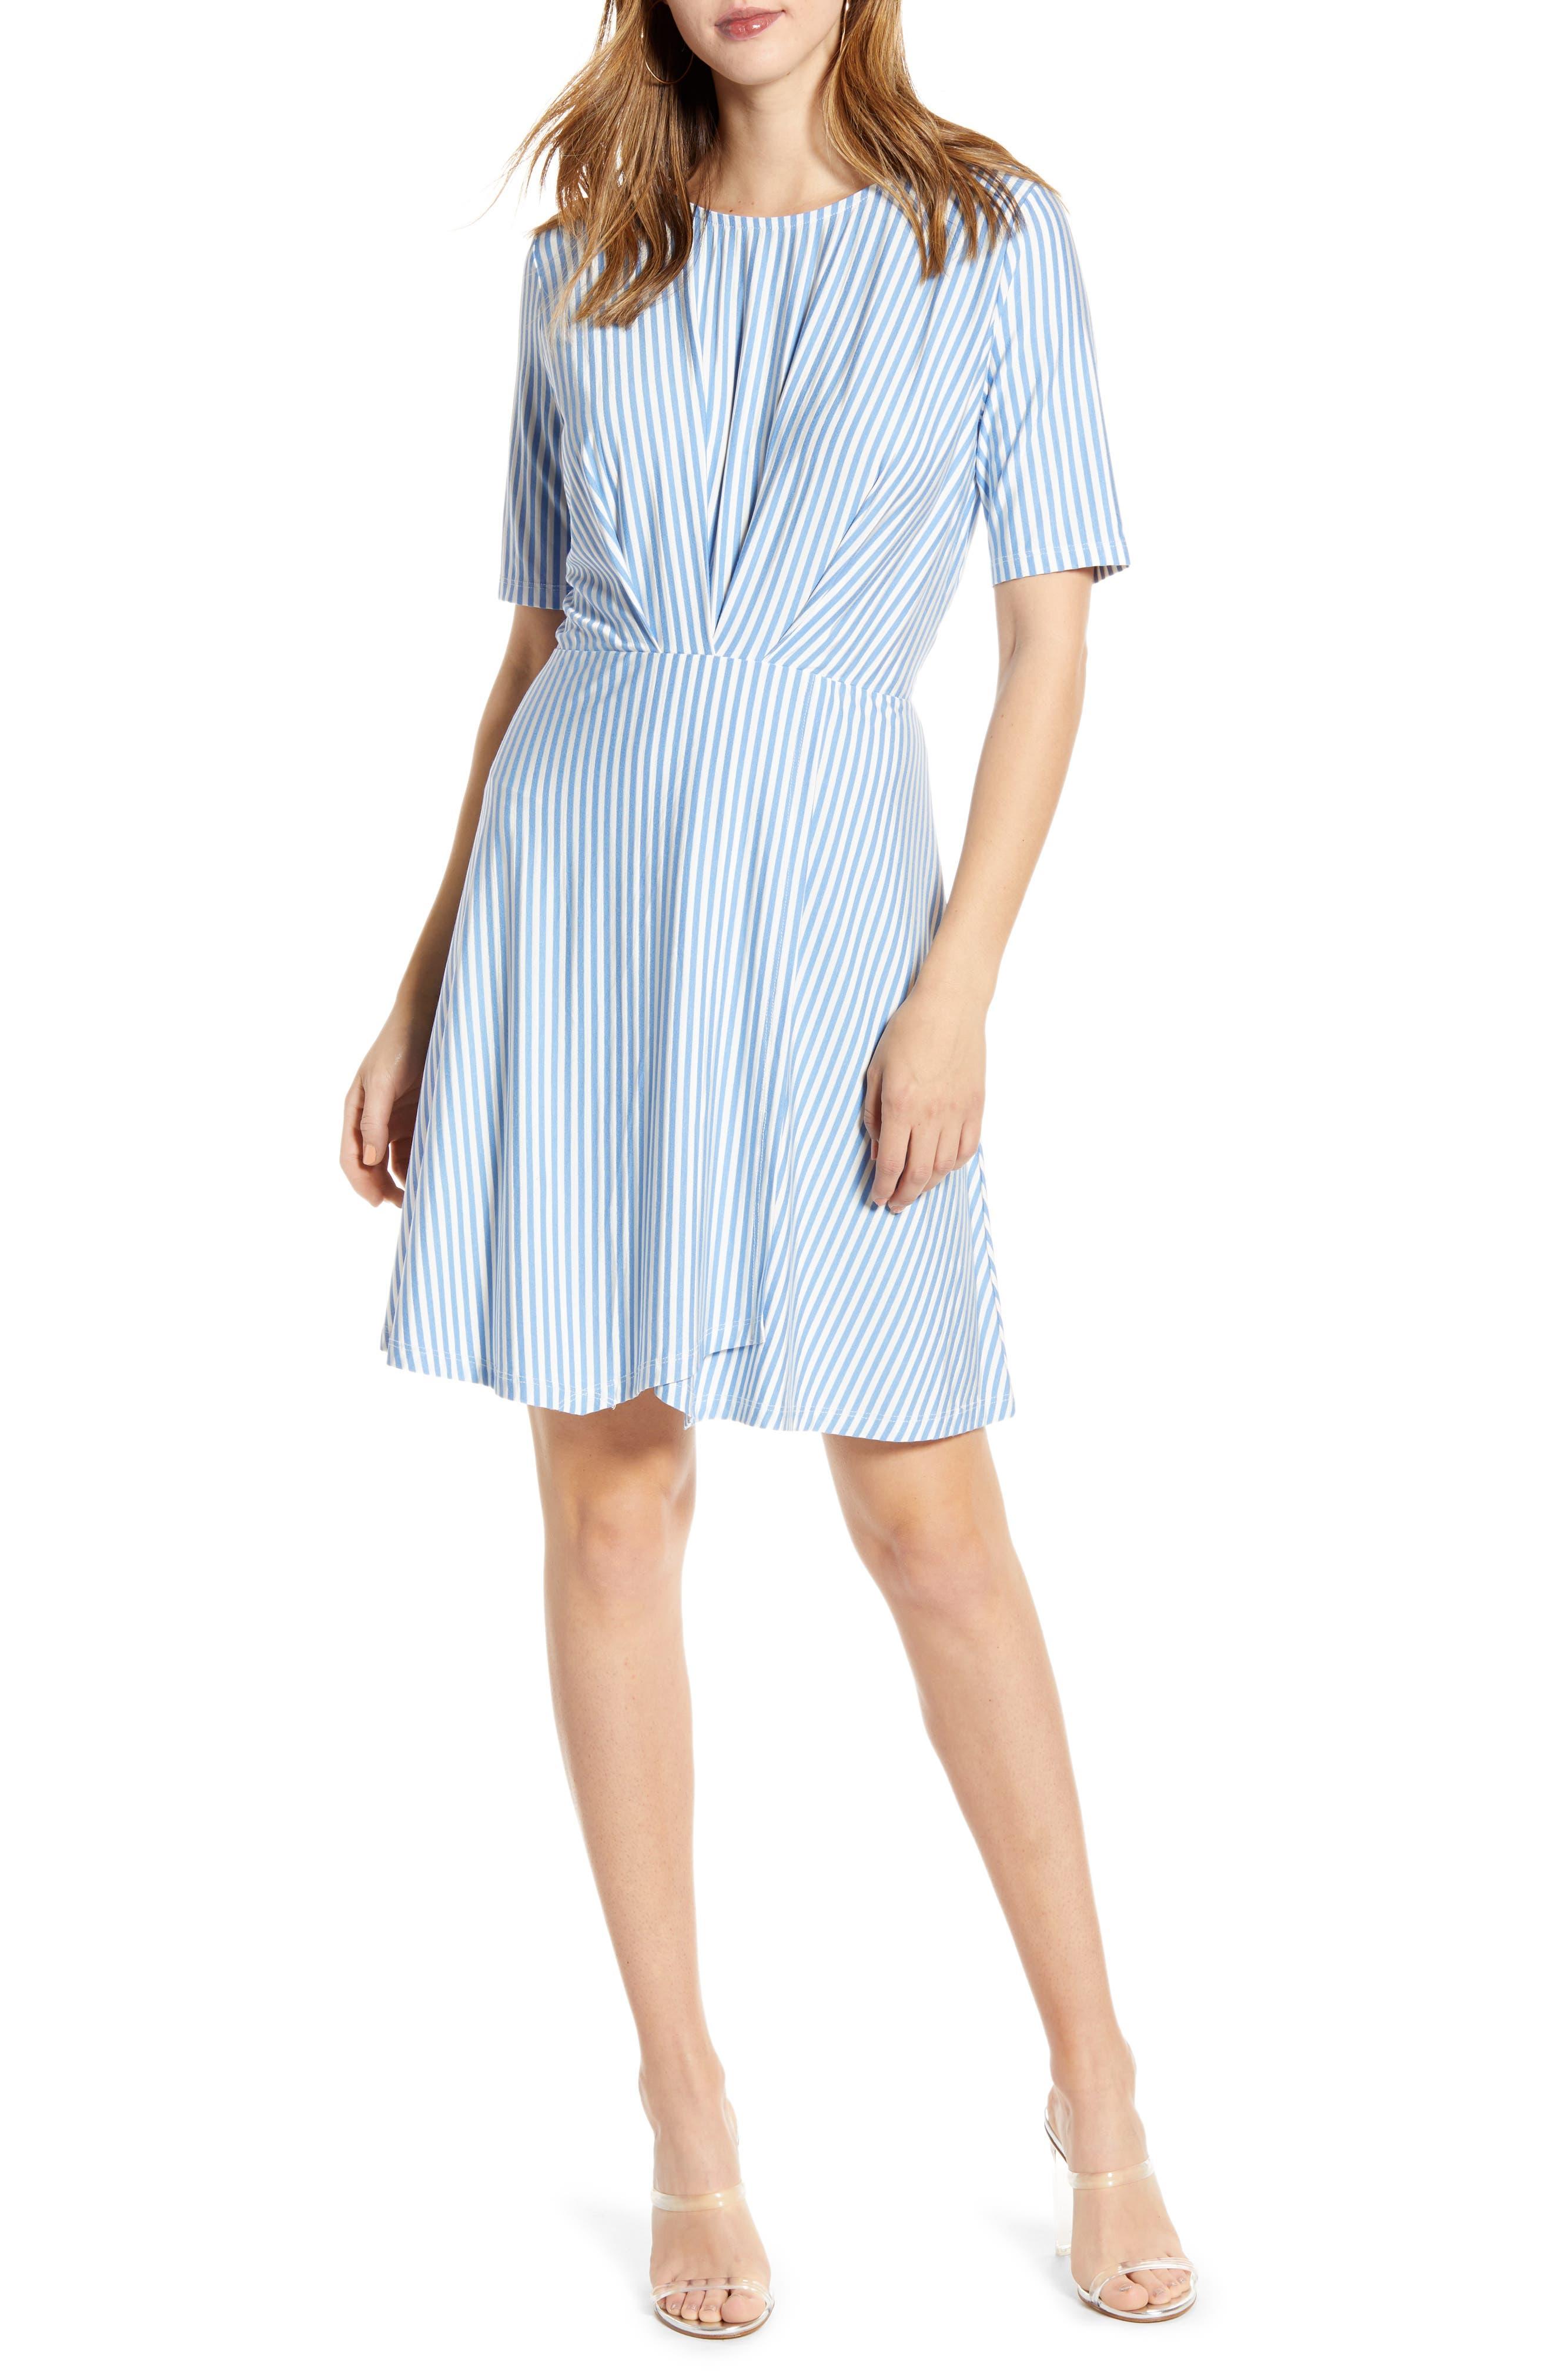 Vero Moda Striped A-Line Minidress, Blue